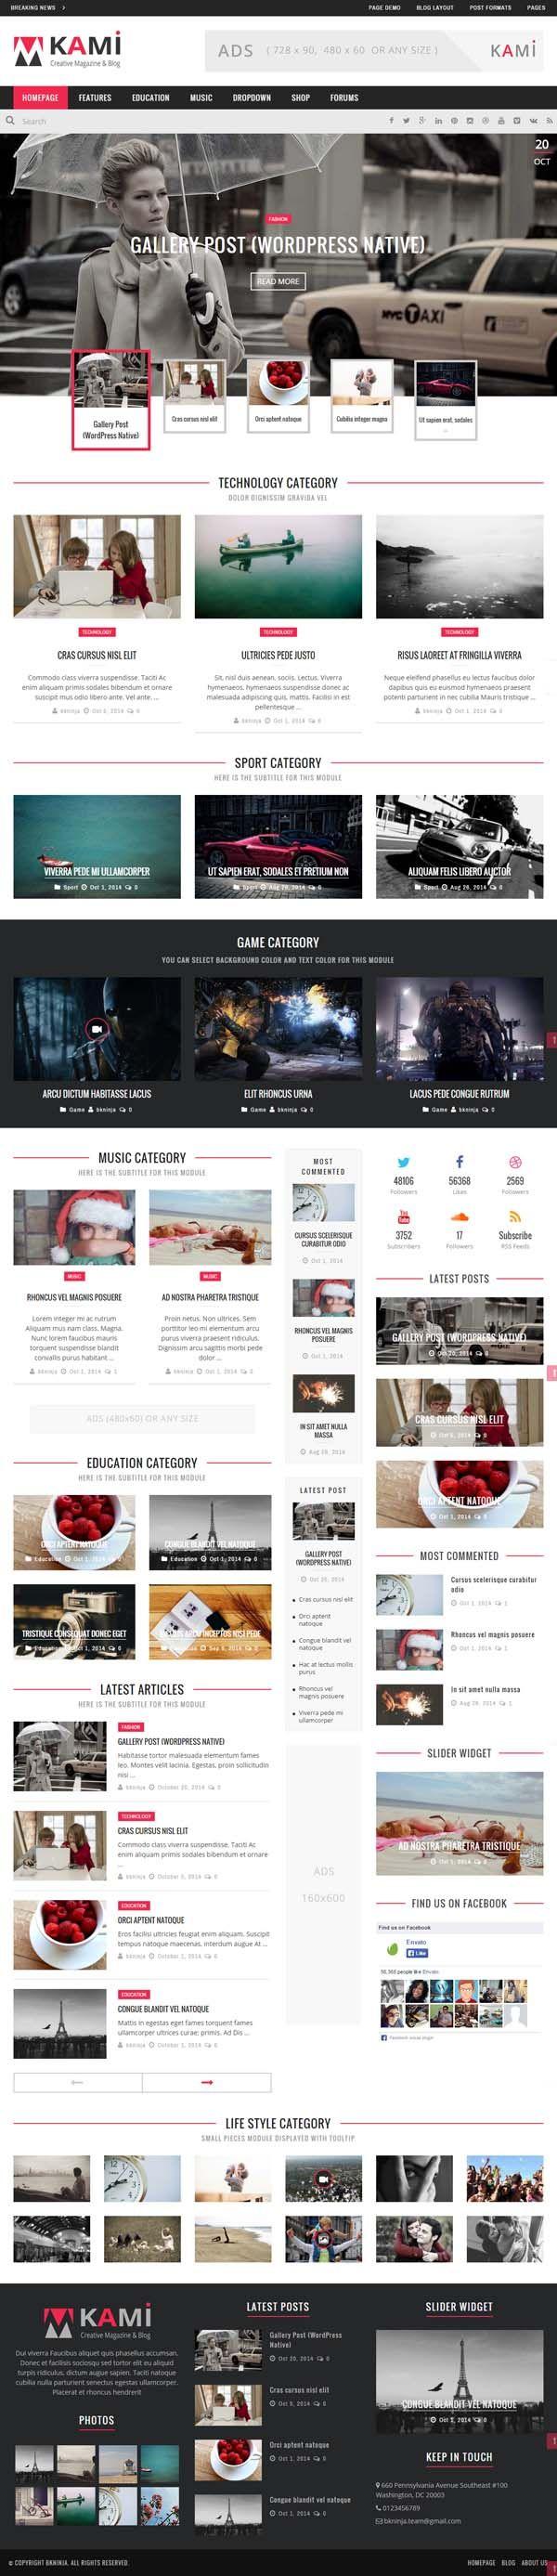 KAMI – Creative Magazine and Blog #html5wordpressthemes #masonrywordPressthemes #responsivewordpressthemes #wordpressthemes